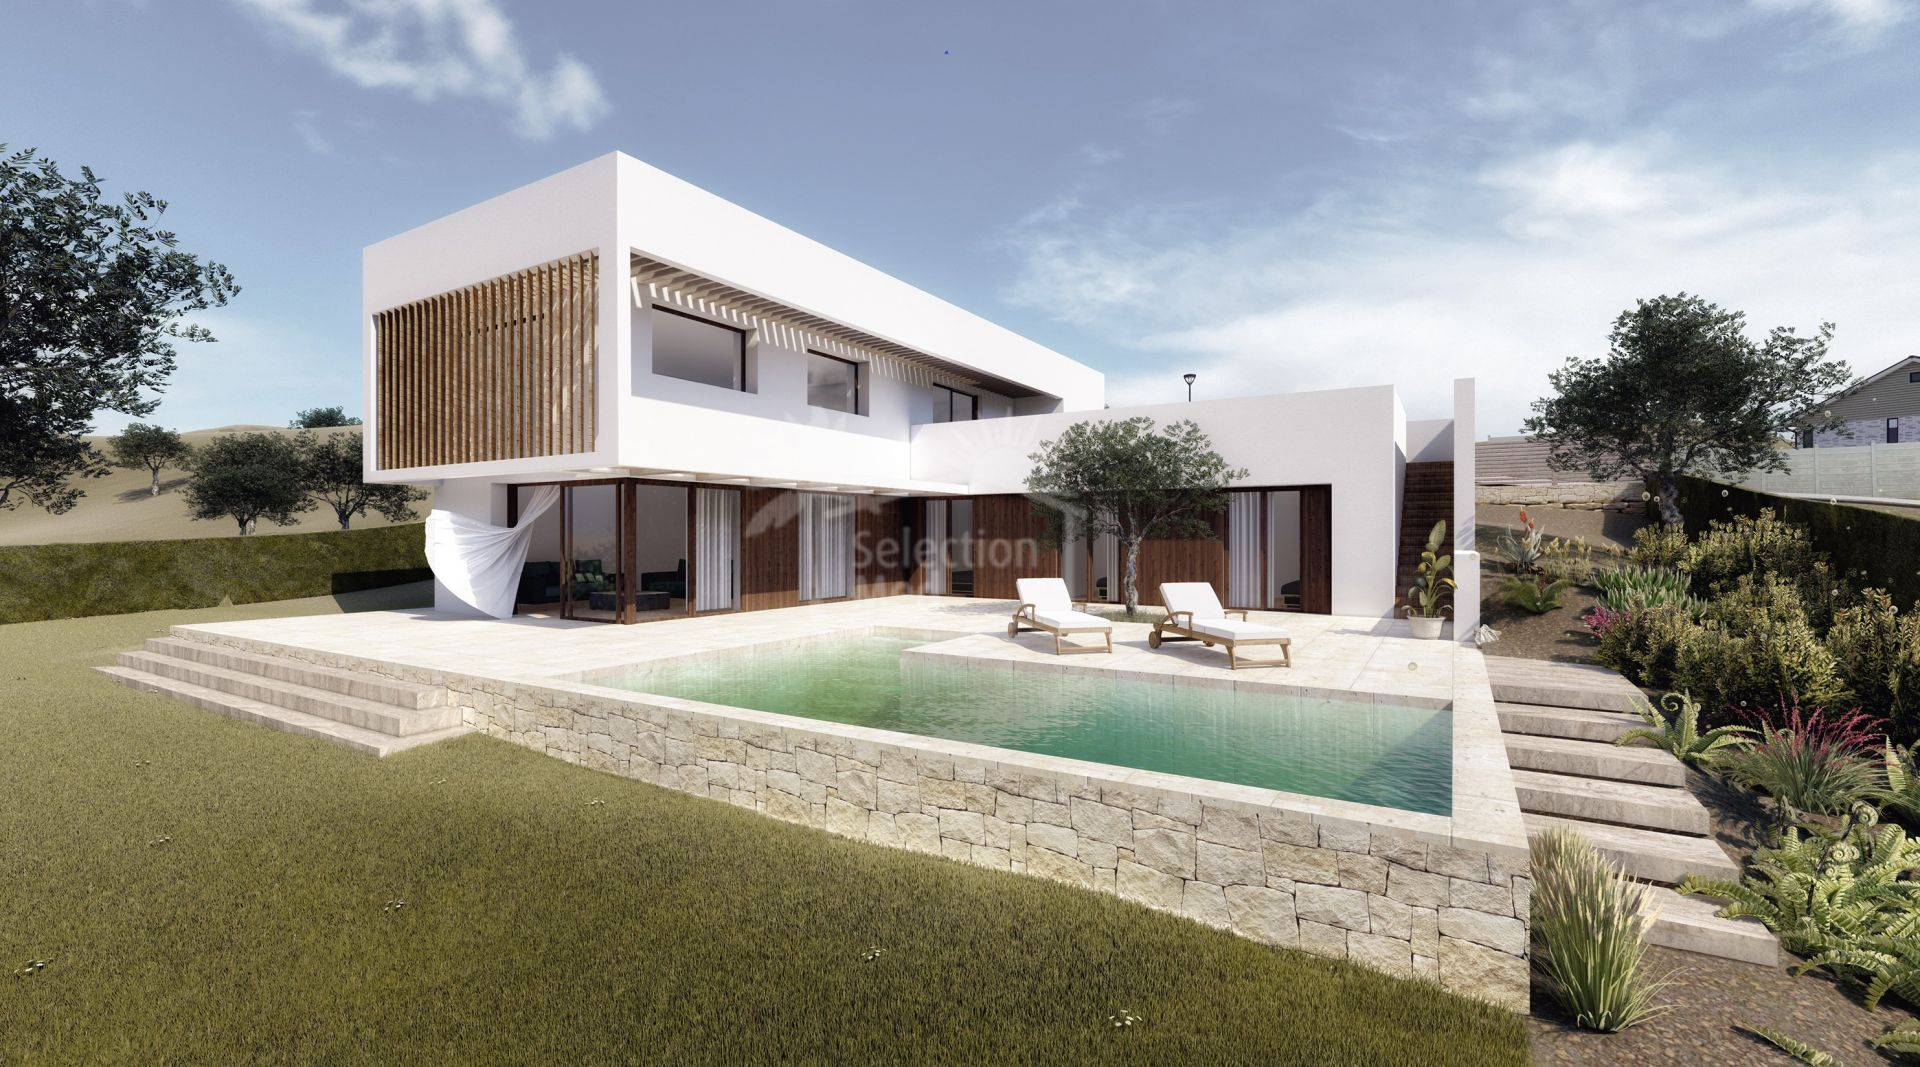 Development in Antequera